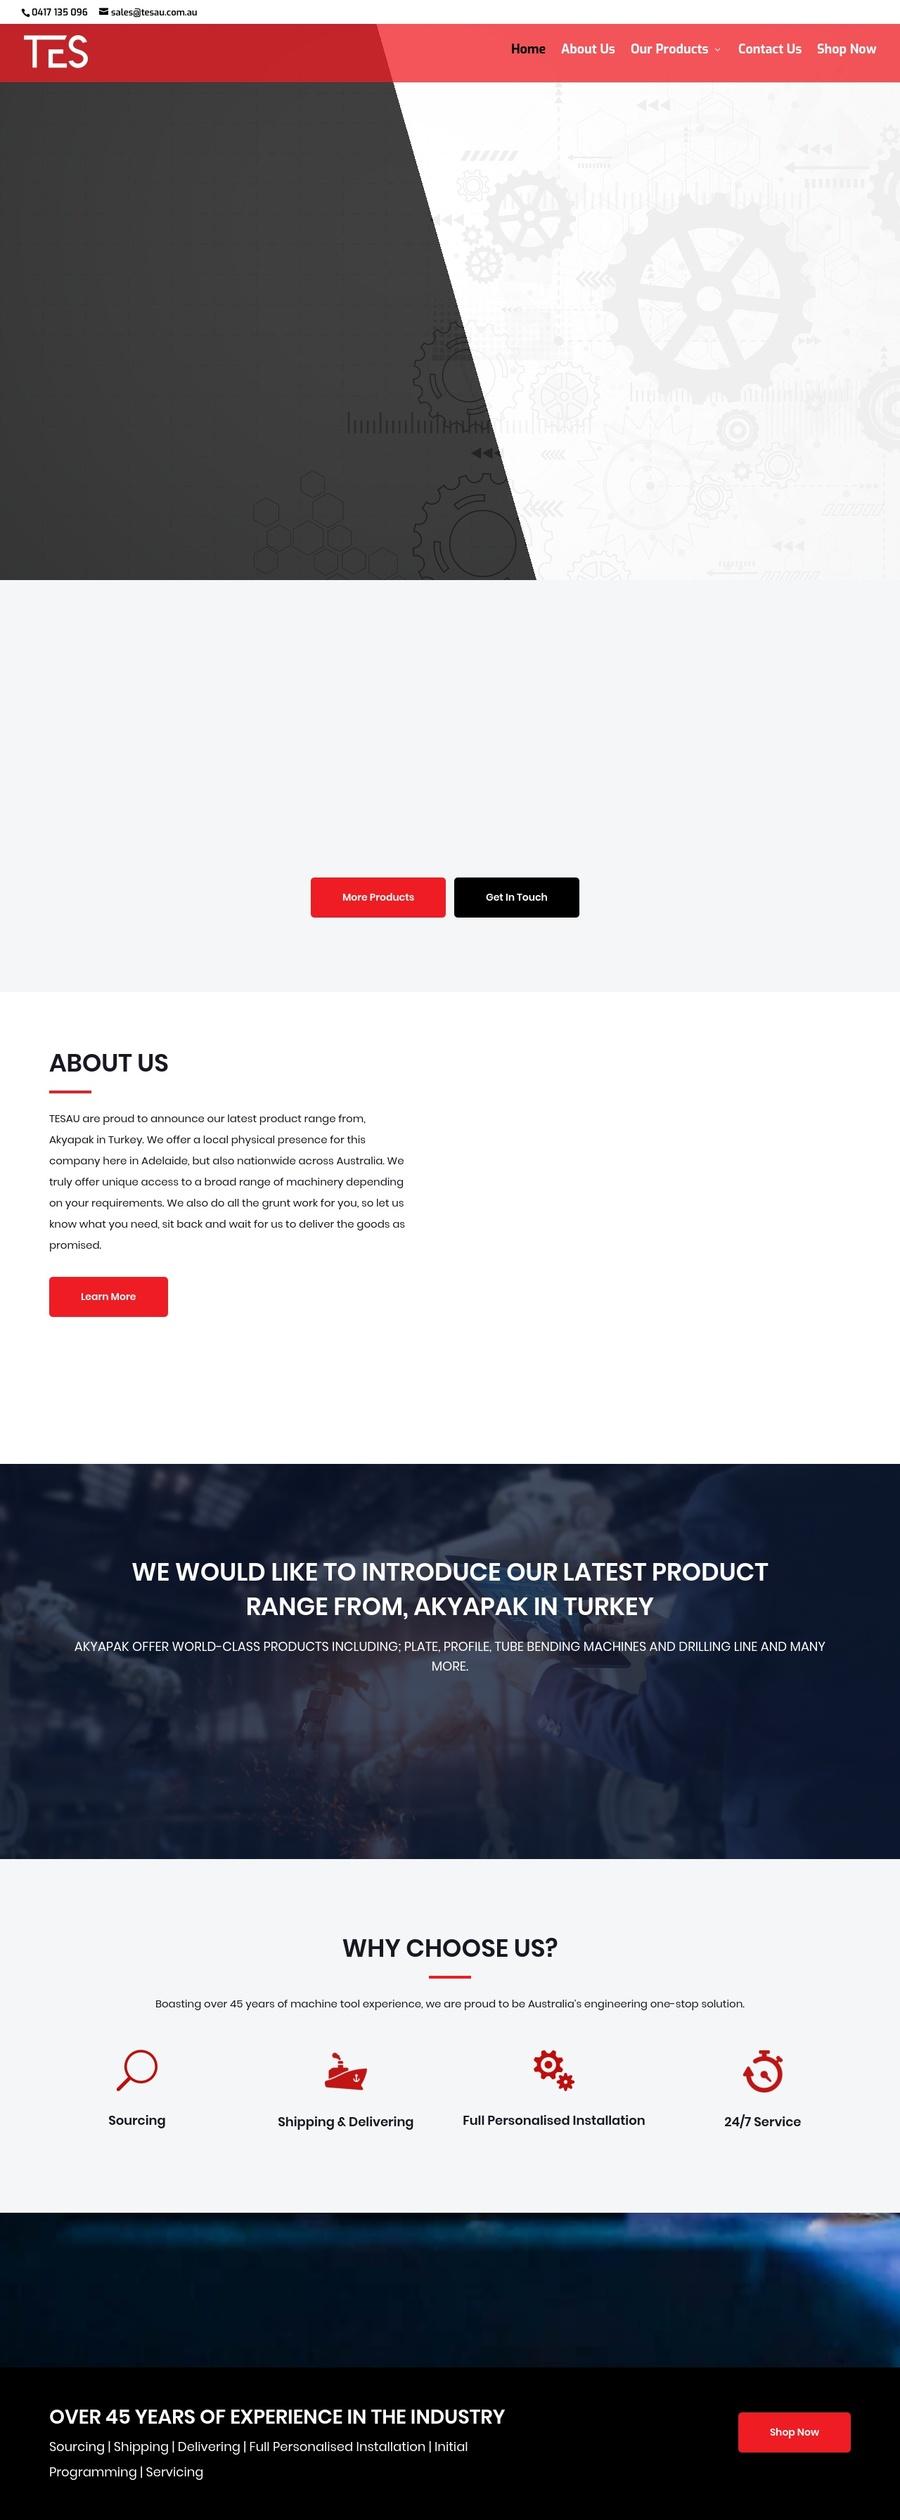 A great web design by International Media House, Adelaide, Australia: